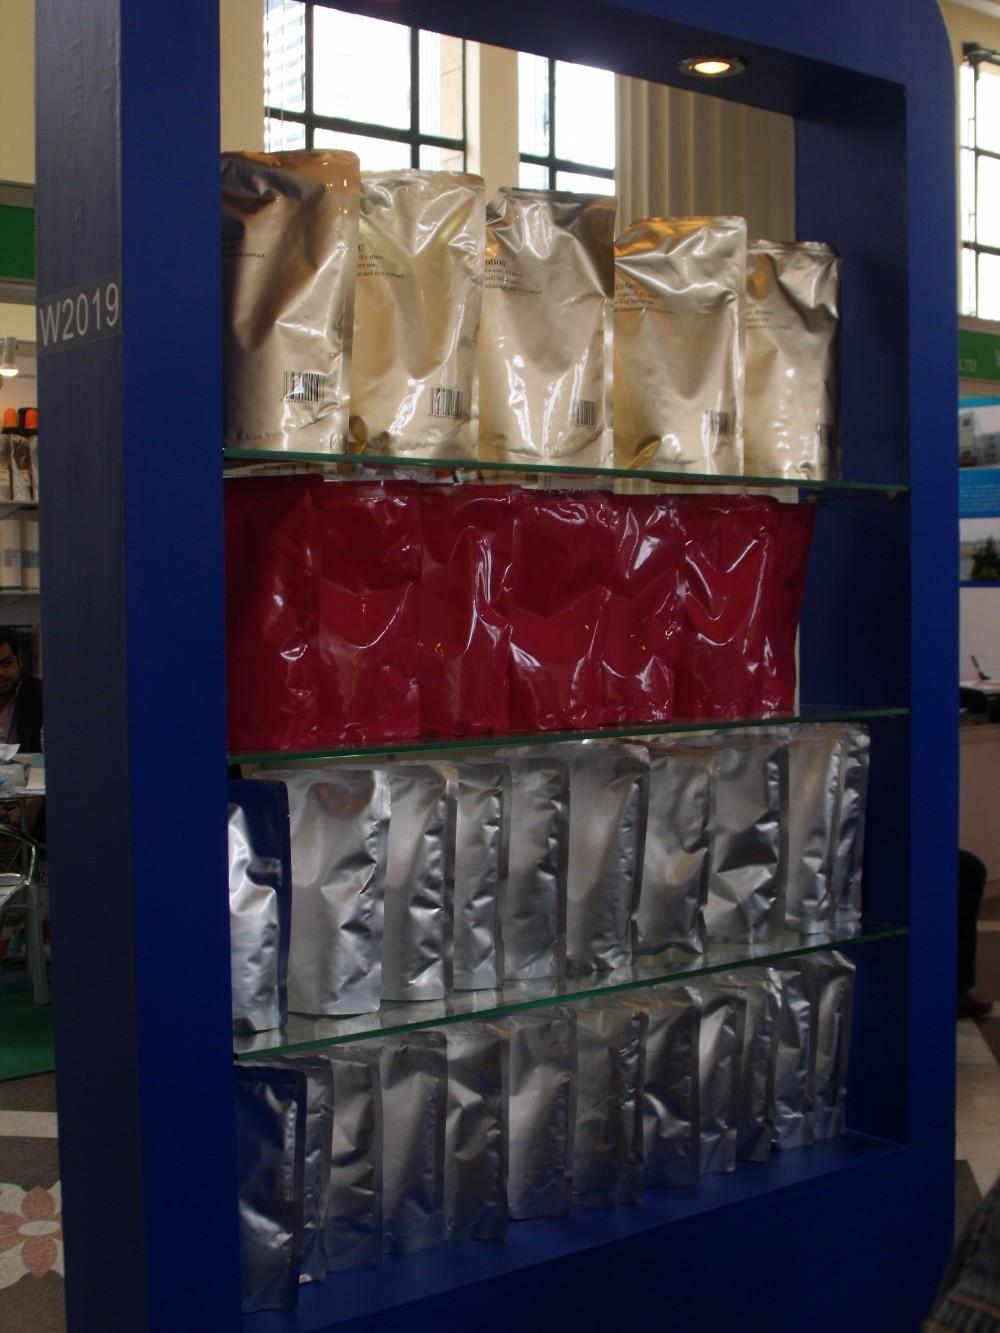 Universal Color Toner Powder Compatible for Konica Minolta C200/203/253/353/8650 AURORA ADC208/218/256 Copier Color Toner Powder